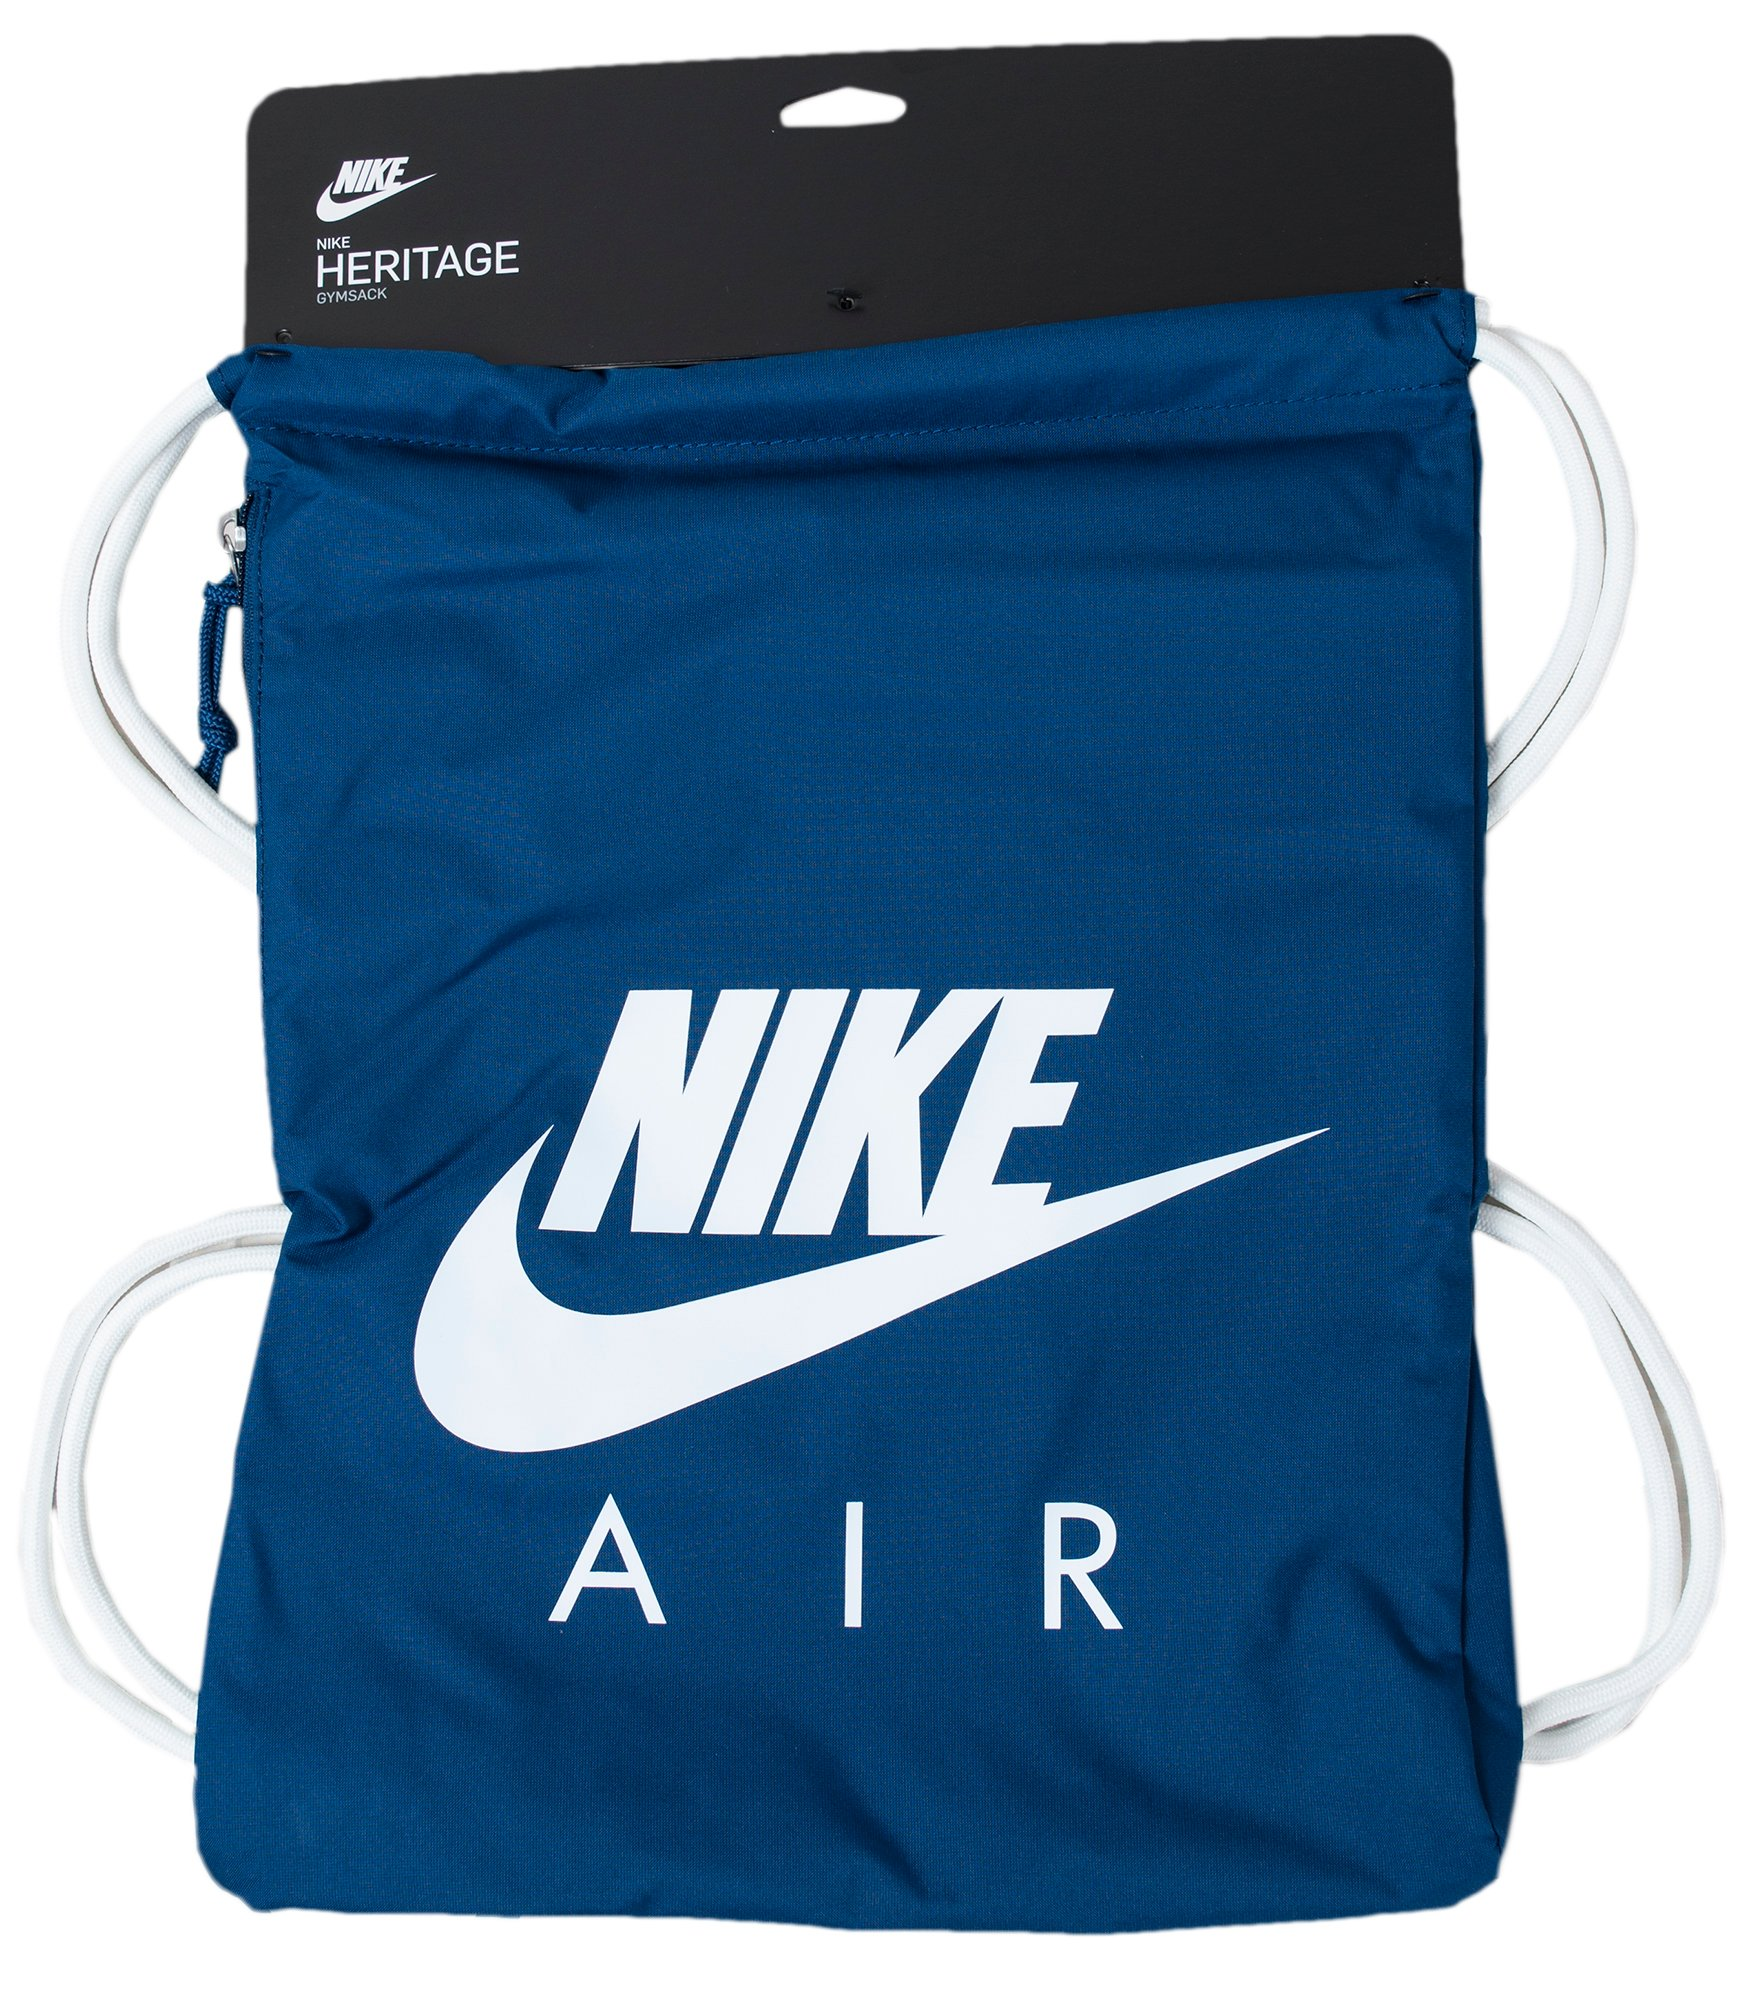 d0f9e63c62f37 Z Sport Worki Torba Plecak Nike Air Kiesz Worek An Na Buty ZqpfxYpnB6